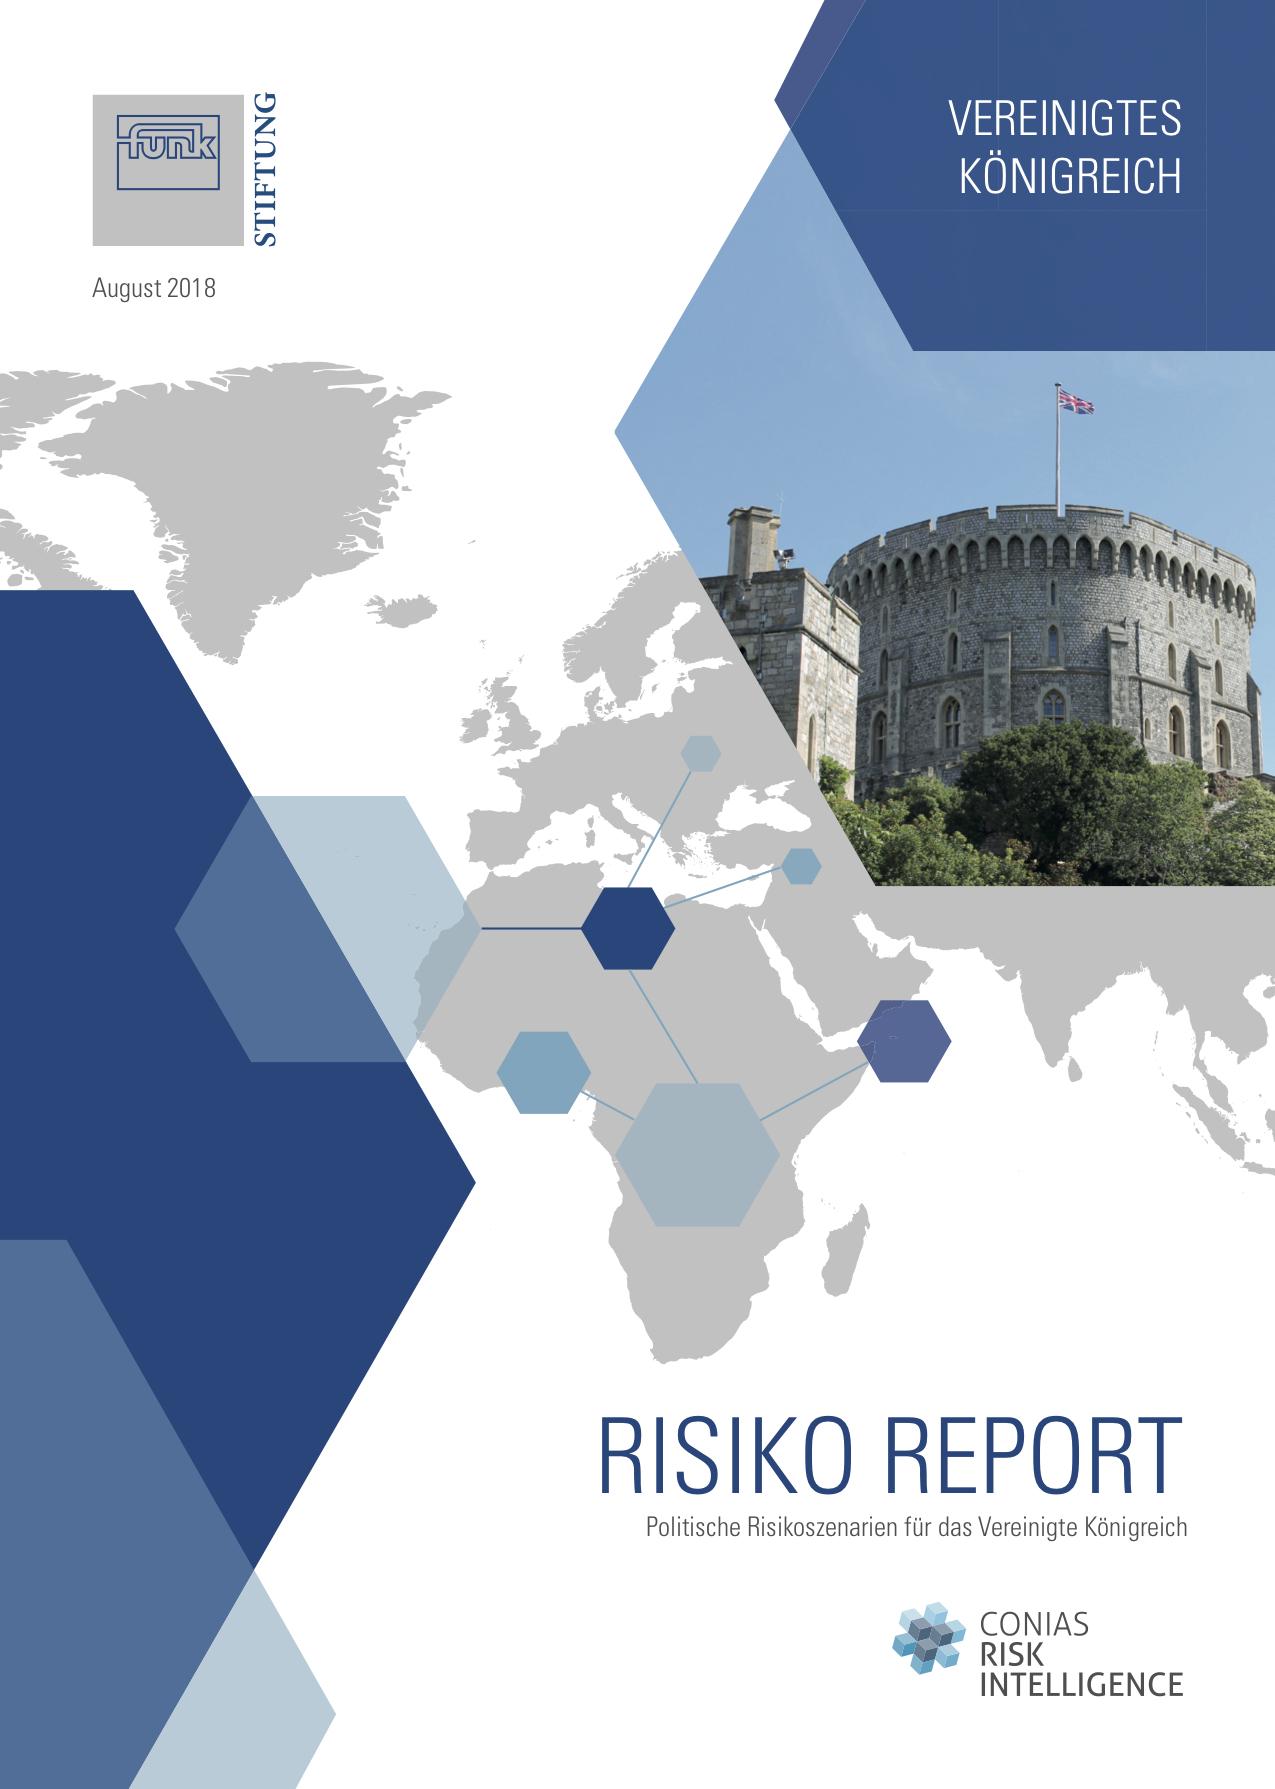 Risiko Report VK-Deutsch